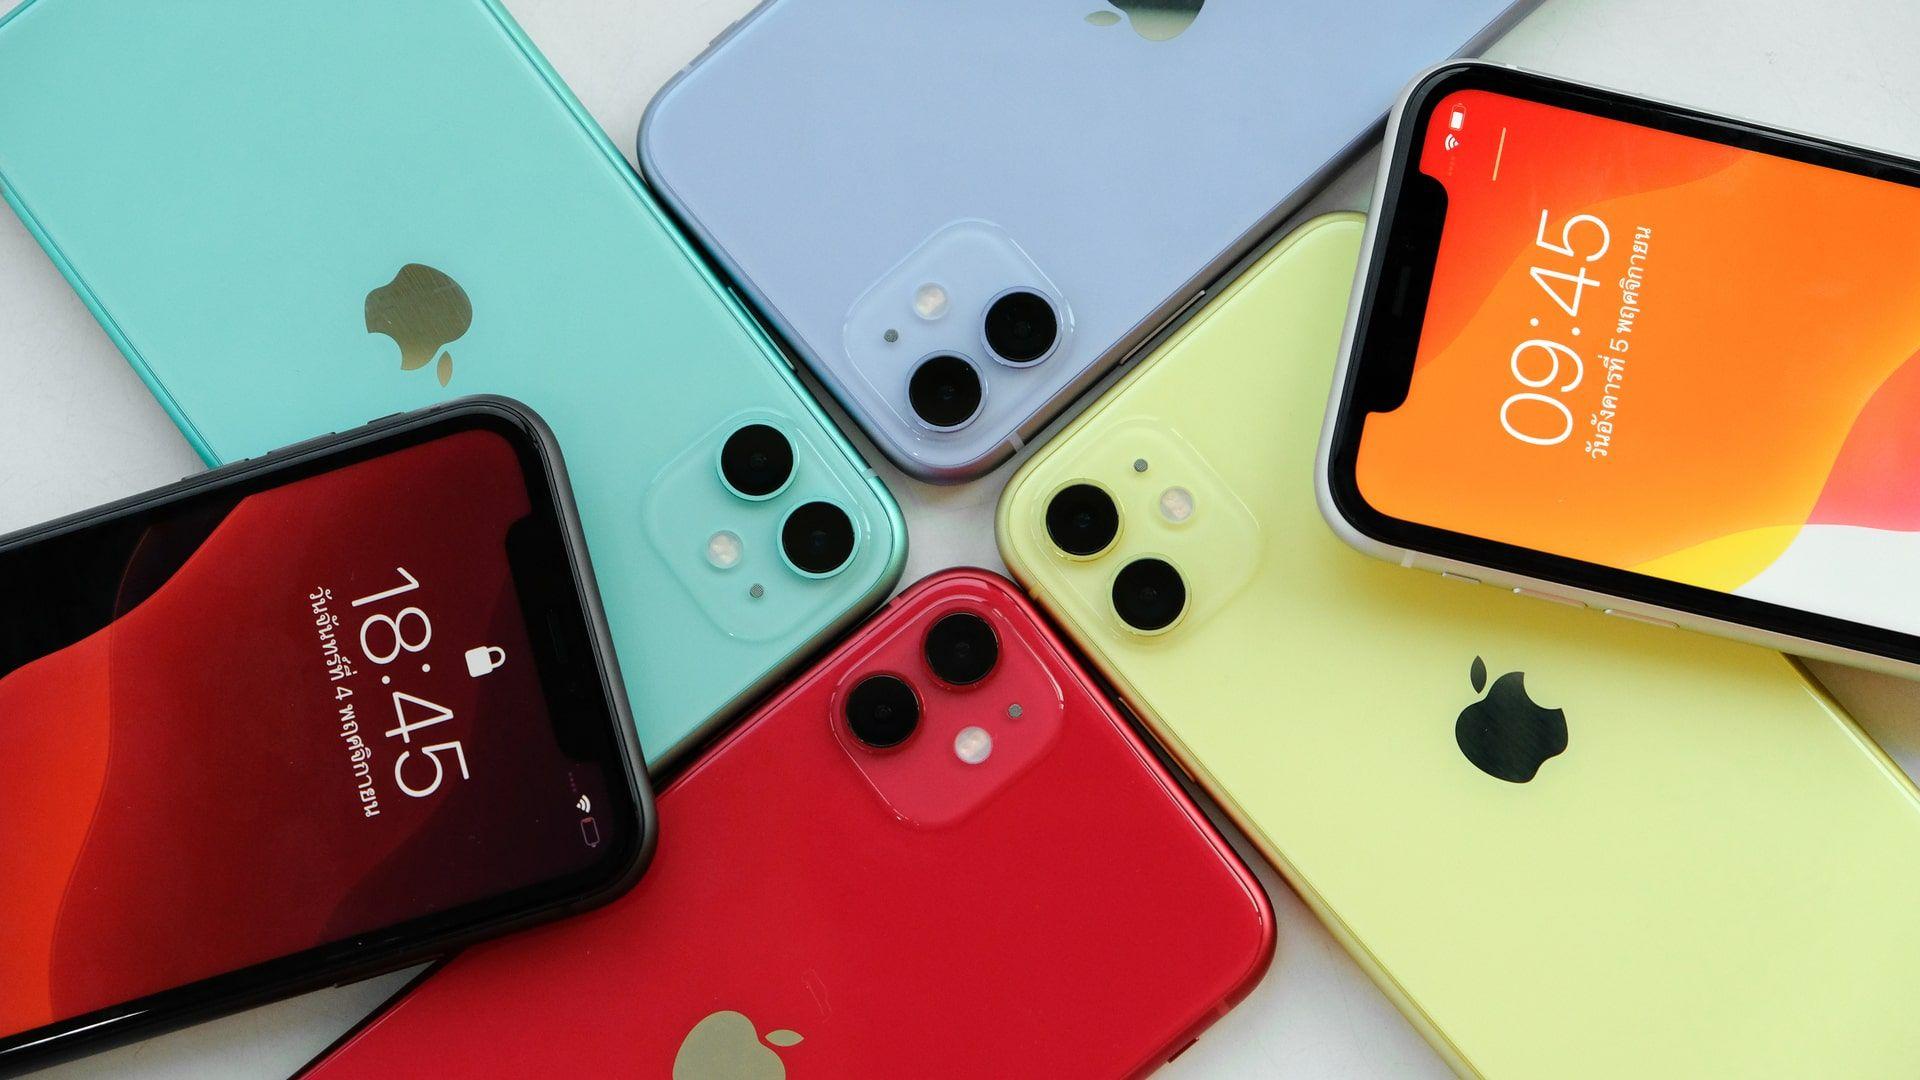 iPhone 11 oferece variedade de cores - Foto: Shutterstock